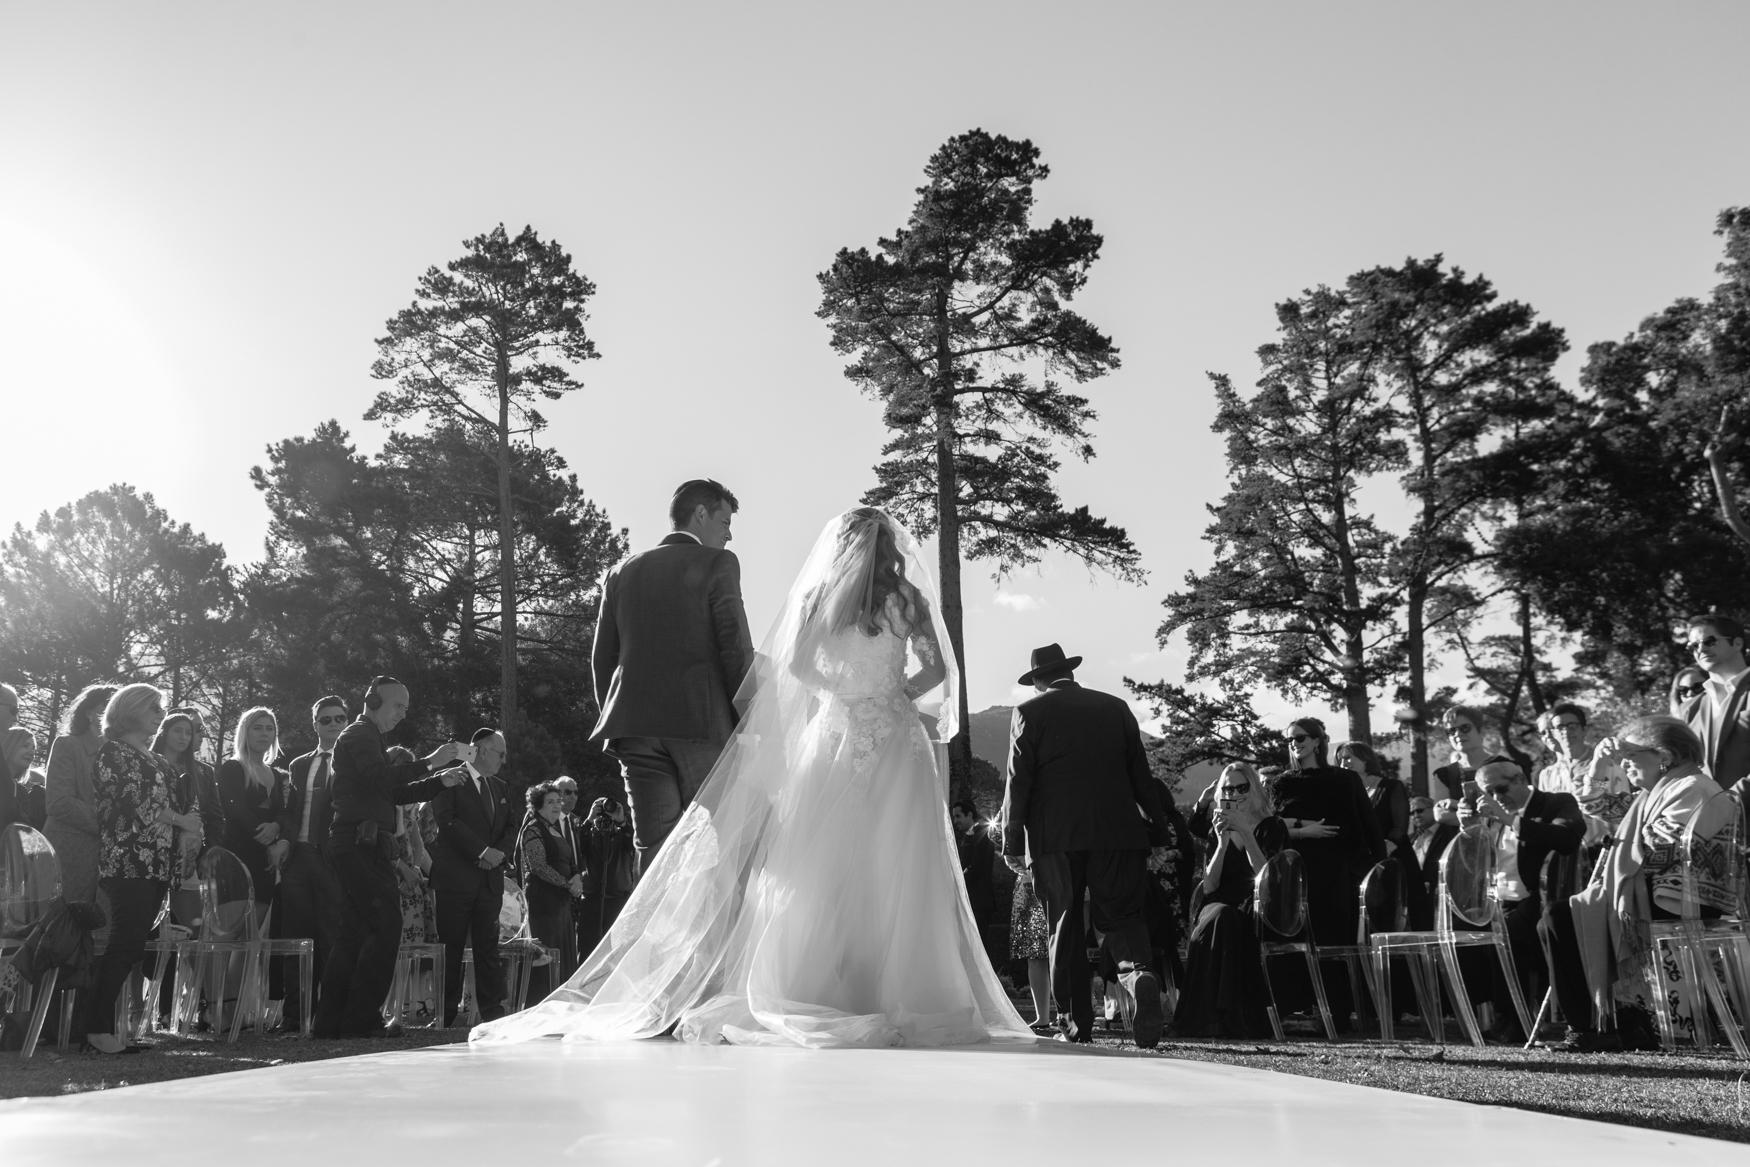 Leon_&_Martine's_Wedding_Photographs_17th_April_2019_@johnhenryweddingphoto_Low_Resolution_Web-242.JPG